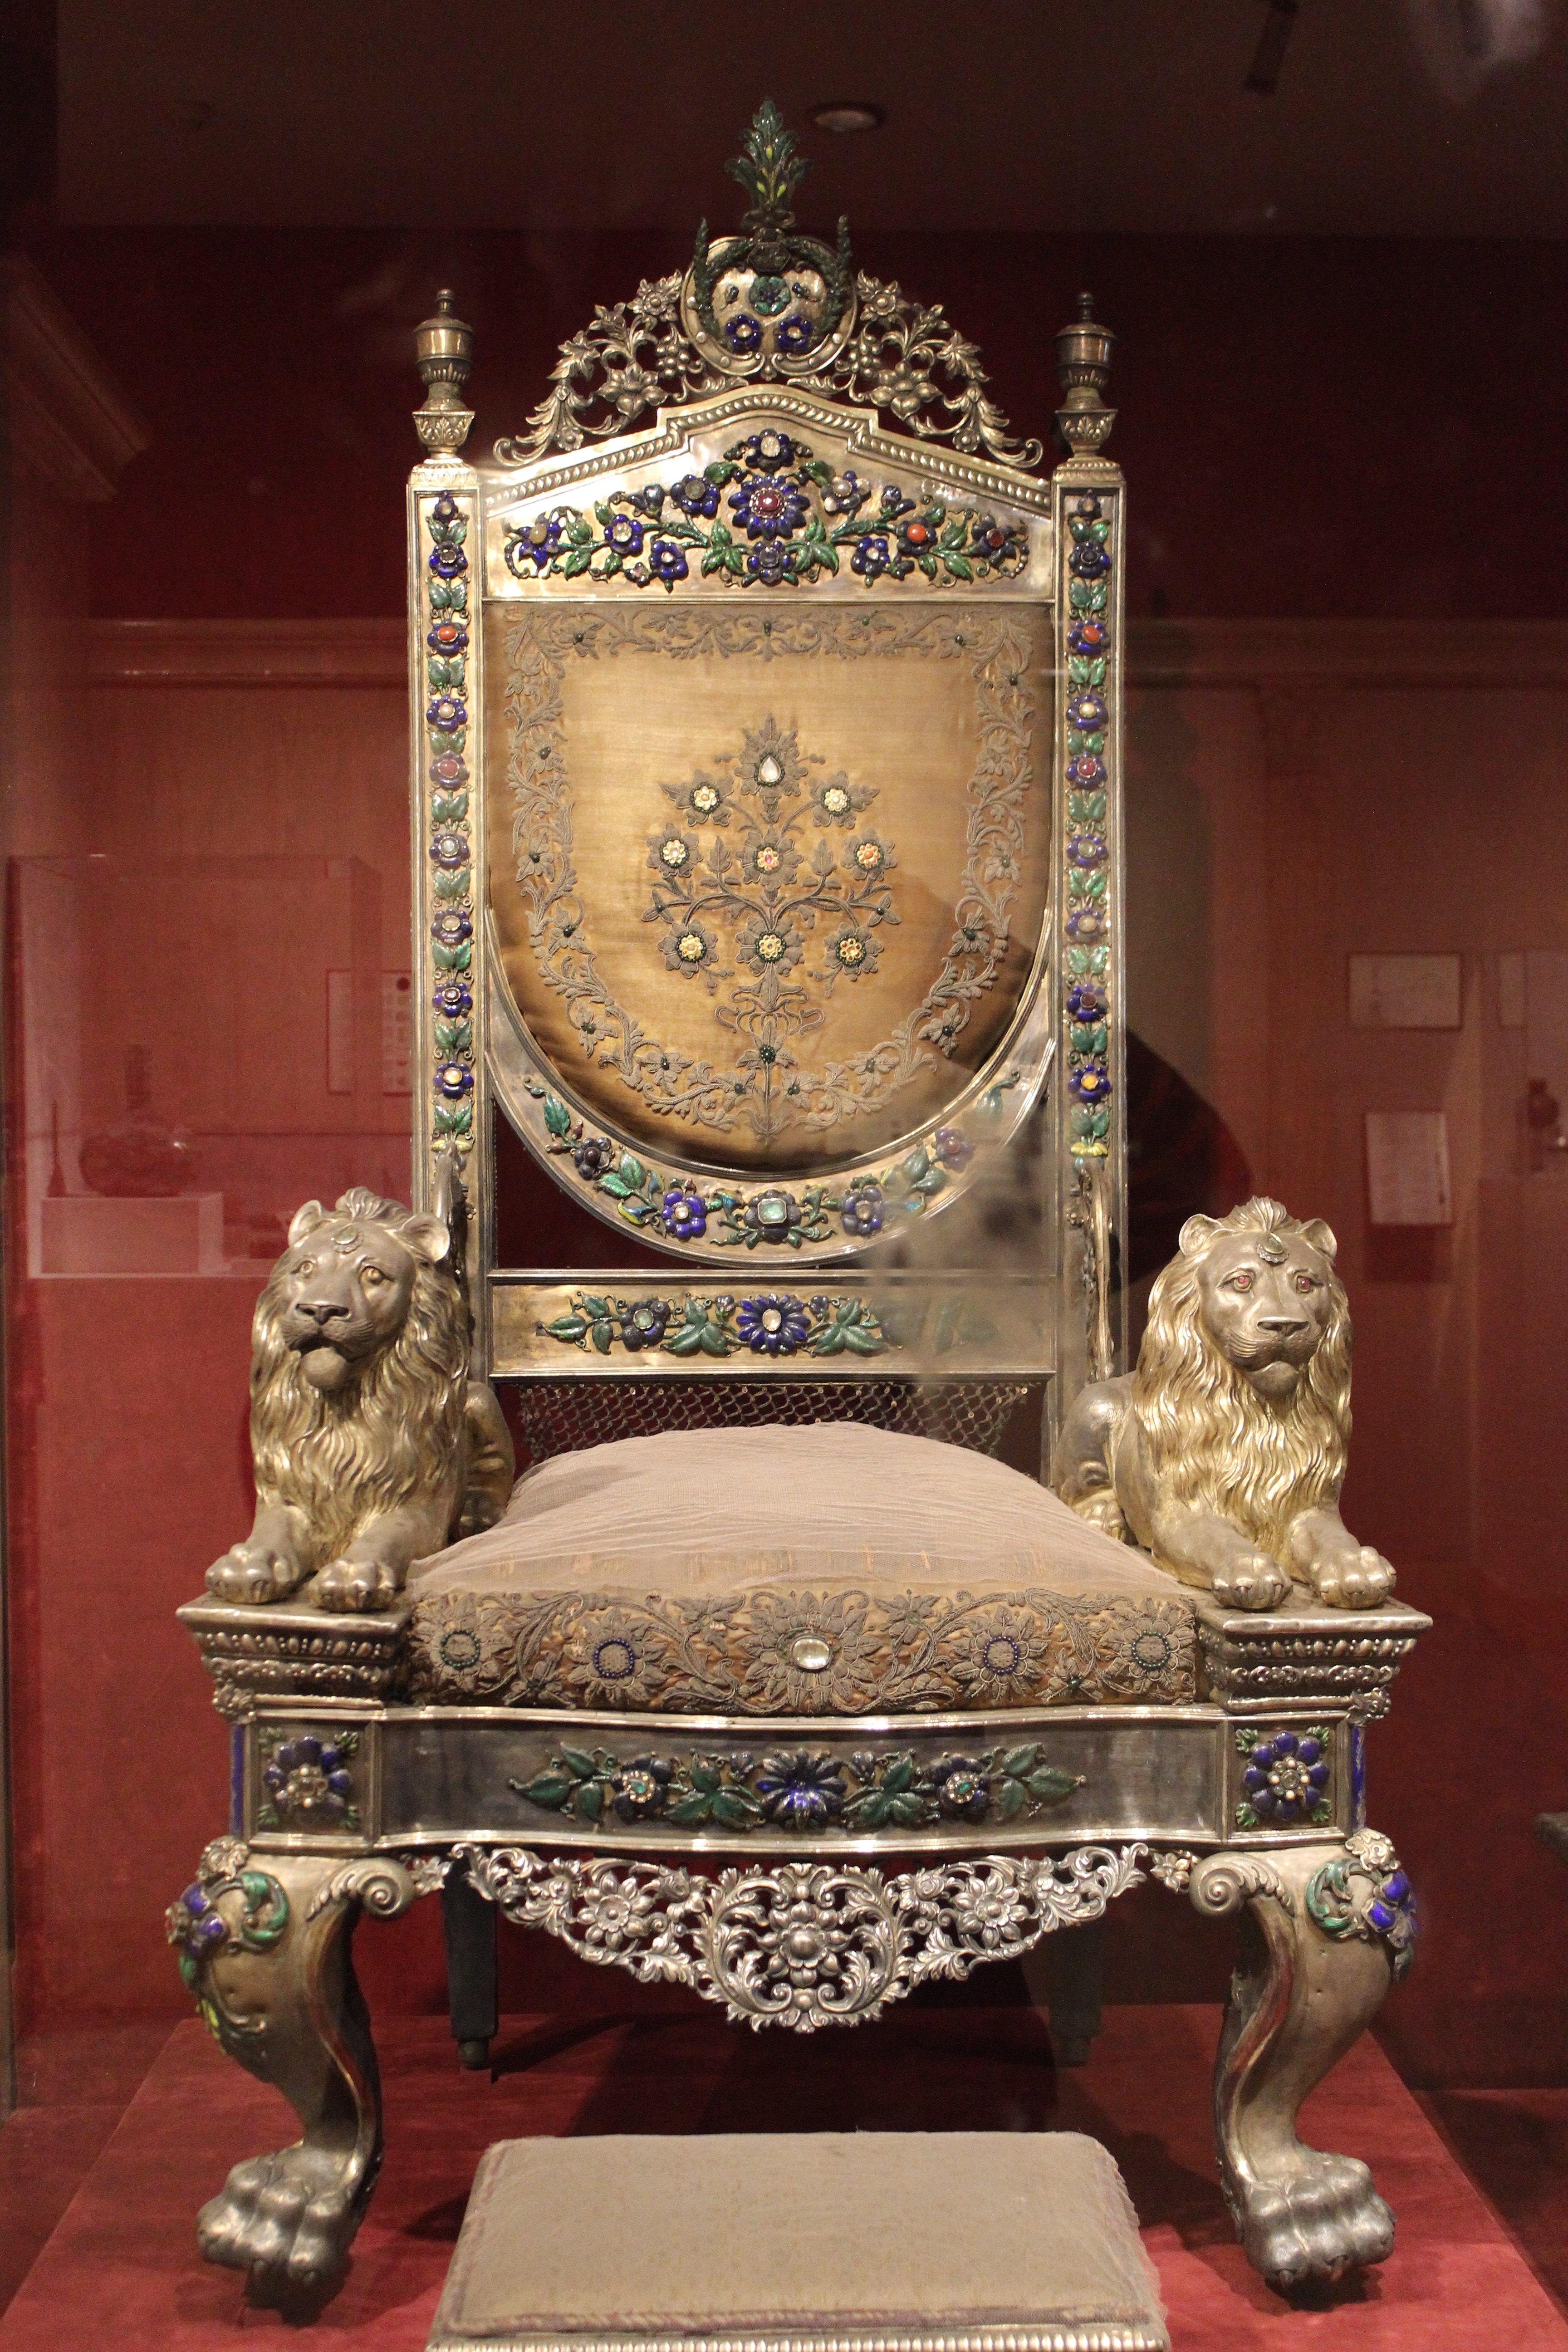 File:Throne national museum india.JPG - Wikimedia Commons